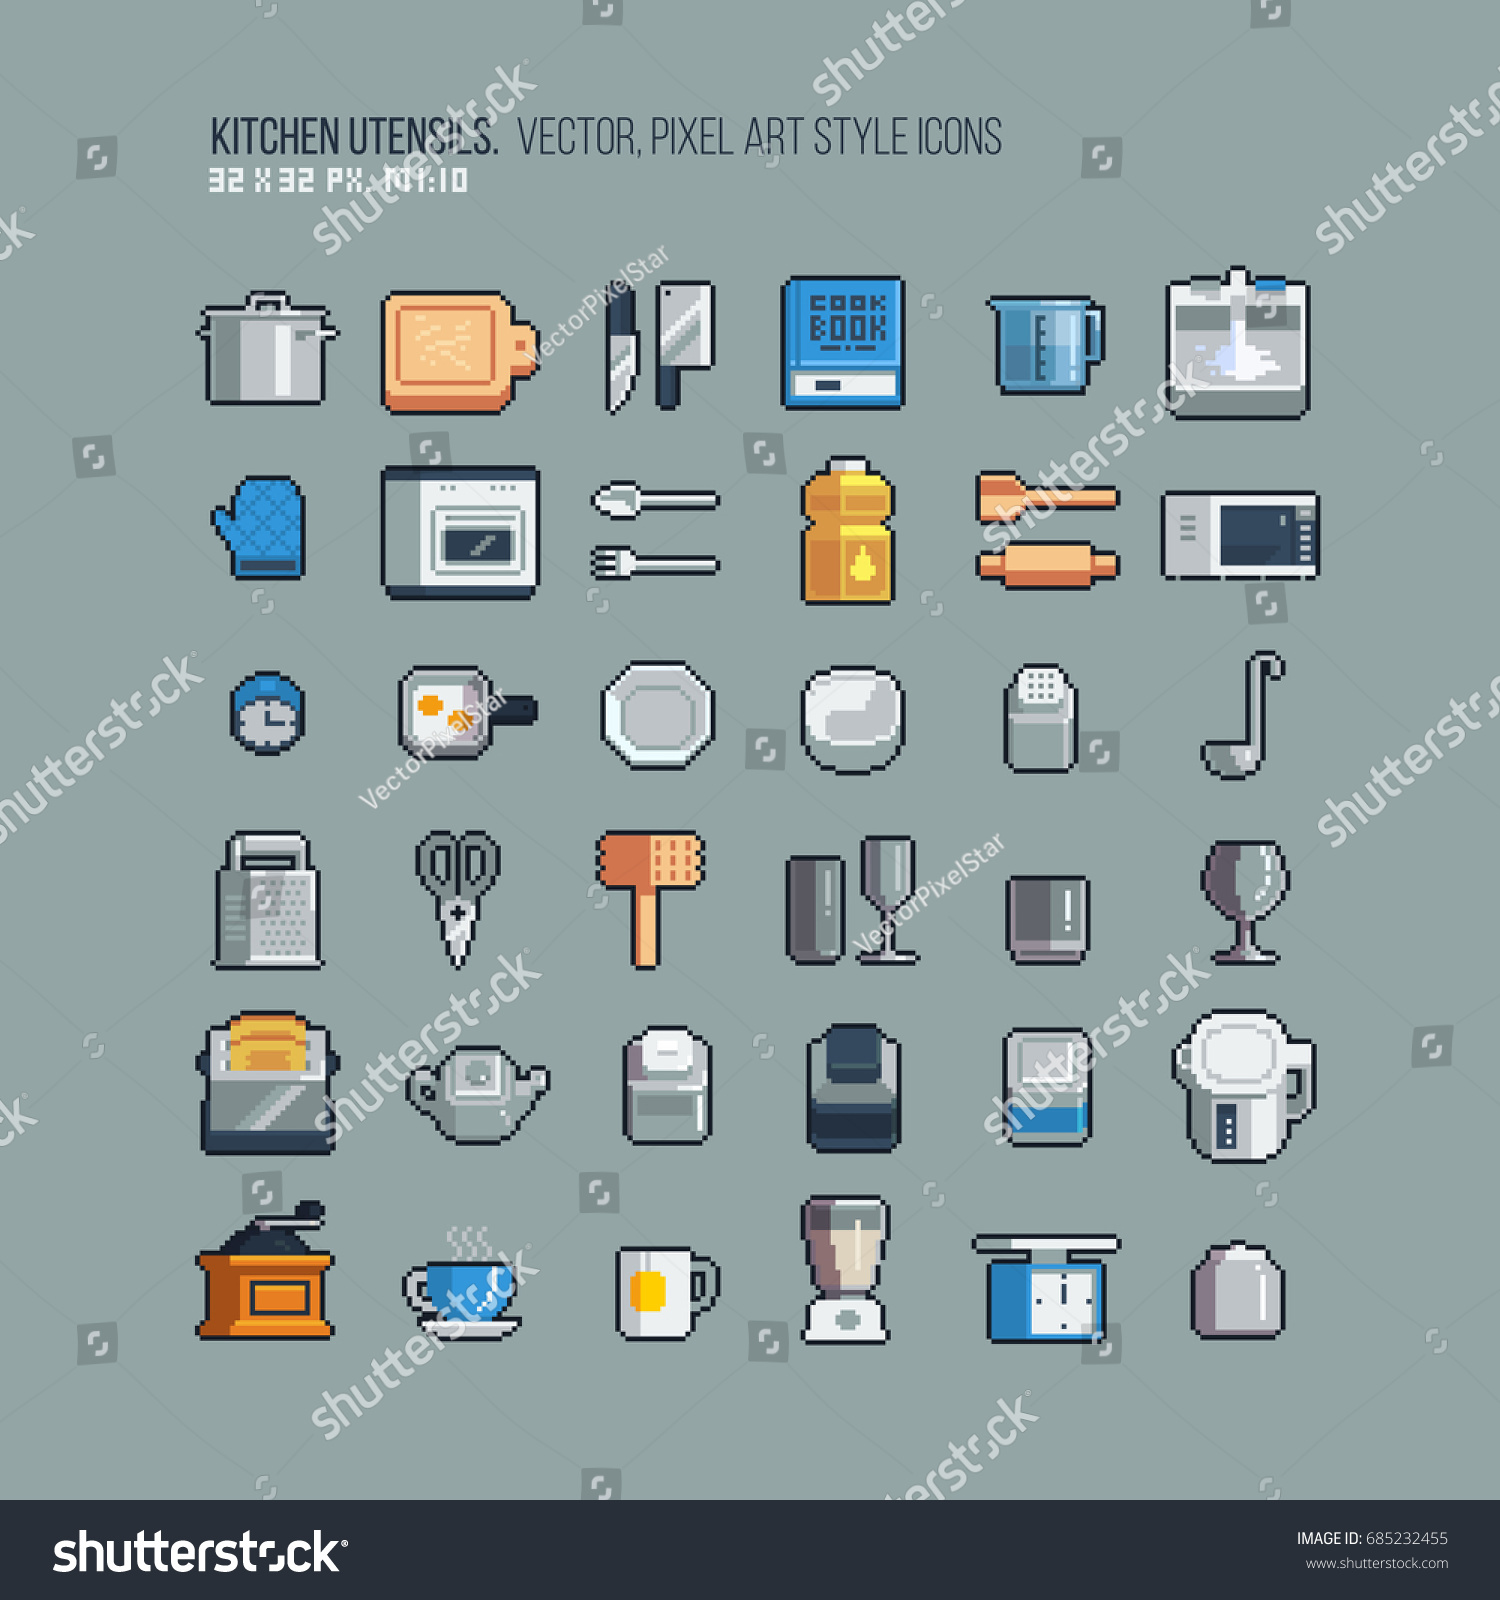 Isometric Pixel Art Kitchen Utensil 32 X 32 Stock Vector HD (Royalty ...